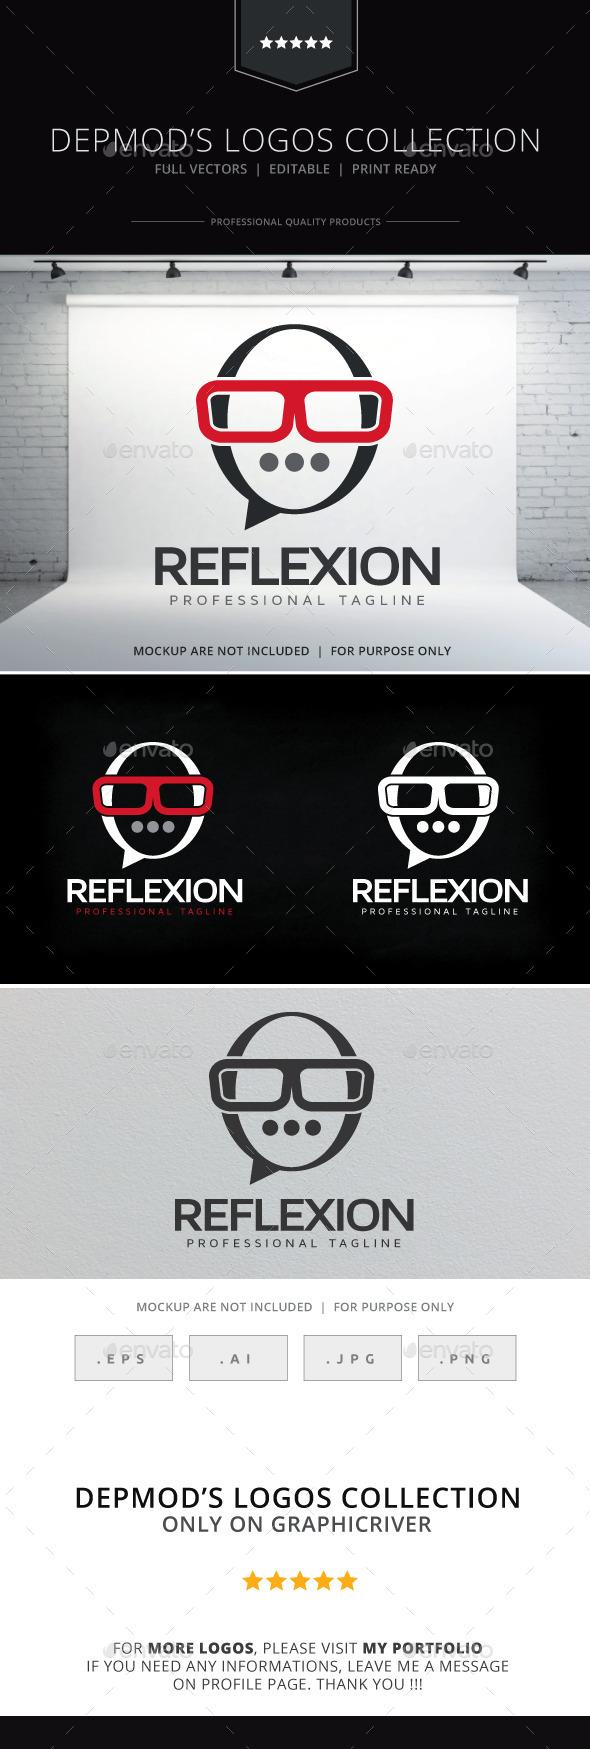 GraphicRiver Reflexion Logo 10556466